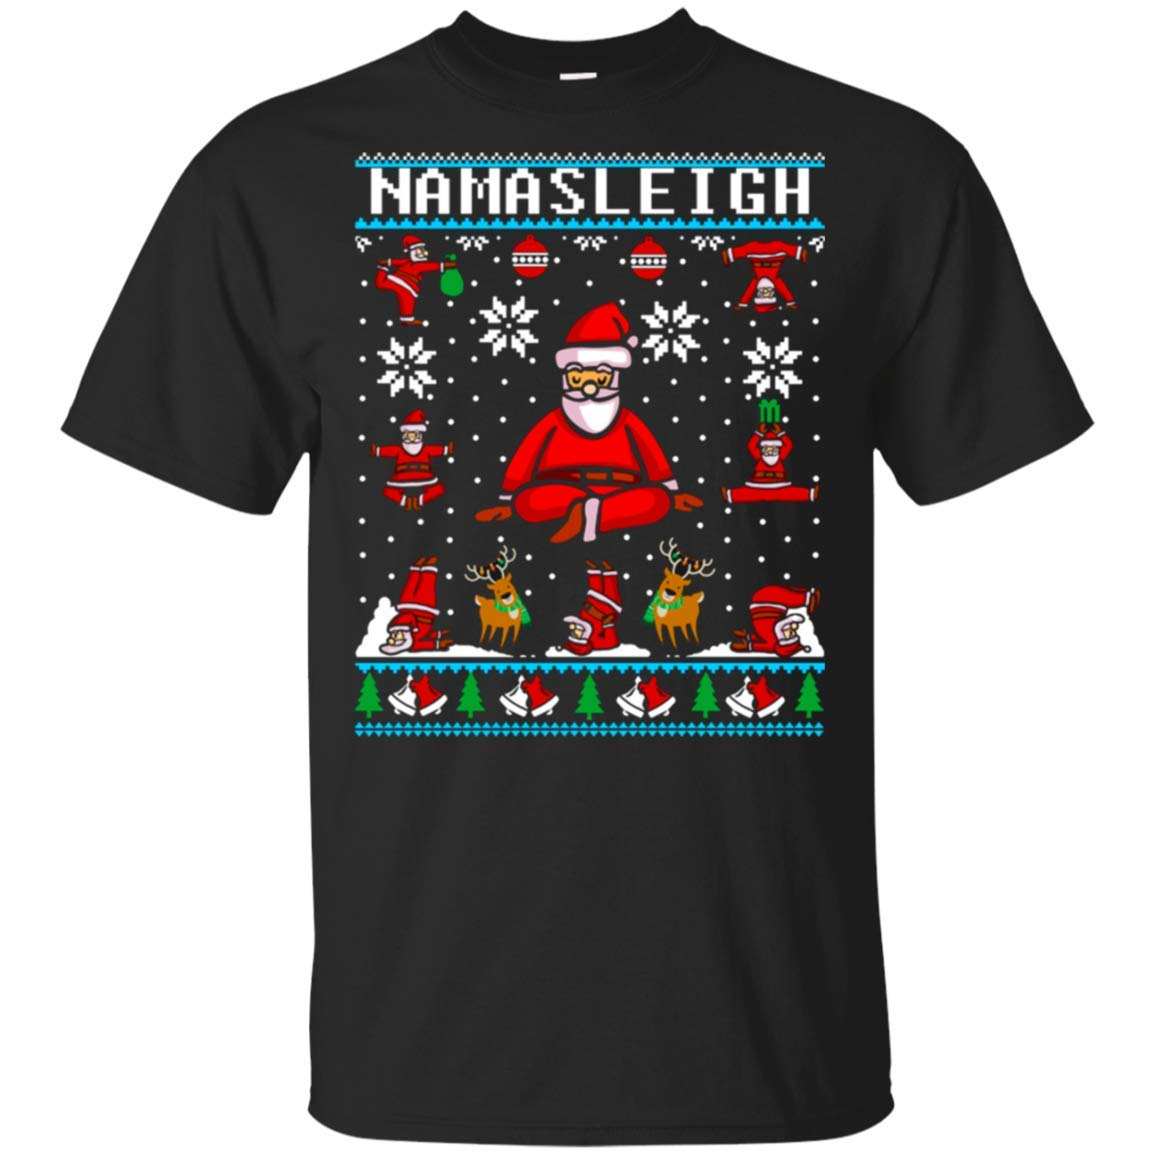 Namasleigh Yoga Funny Christmas Sweater Tshirt Black S5 Awesome Gifts